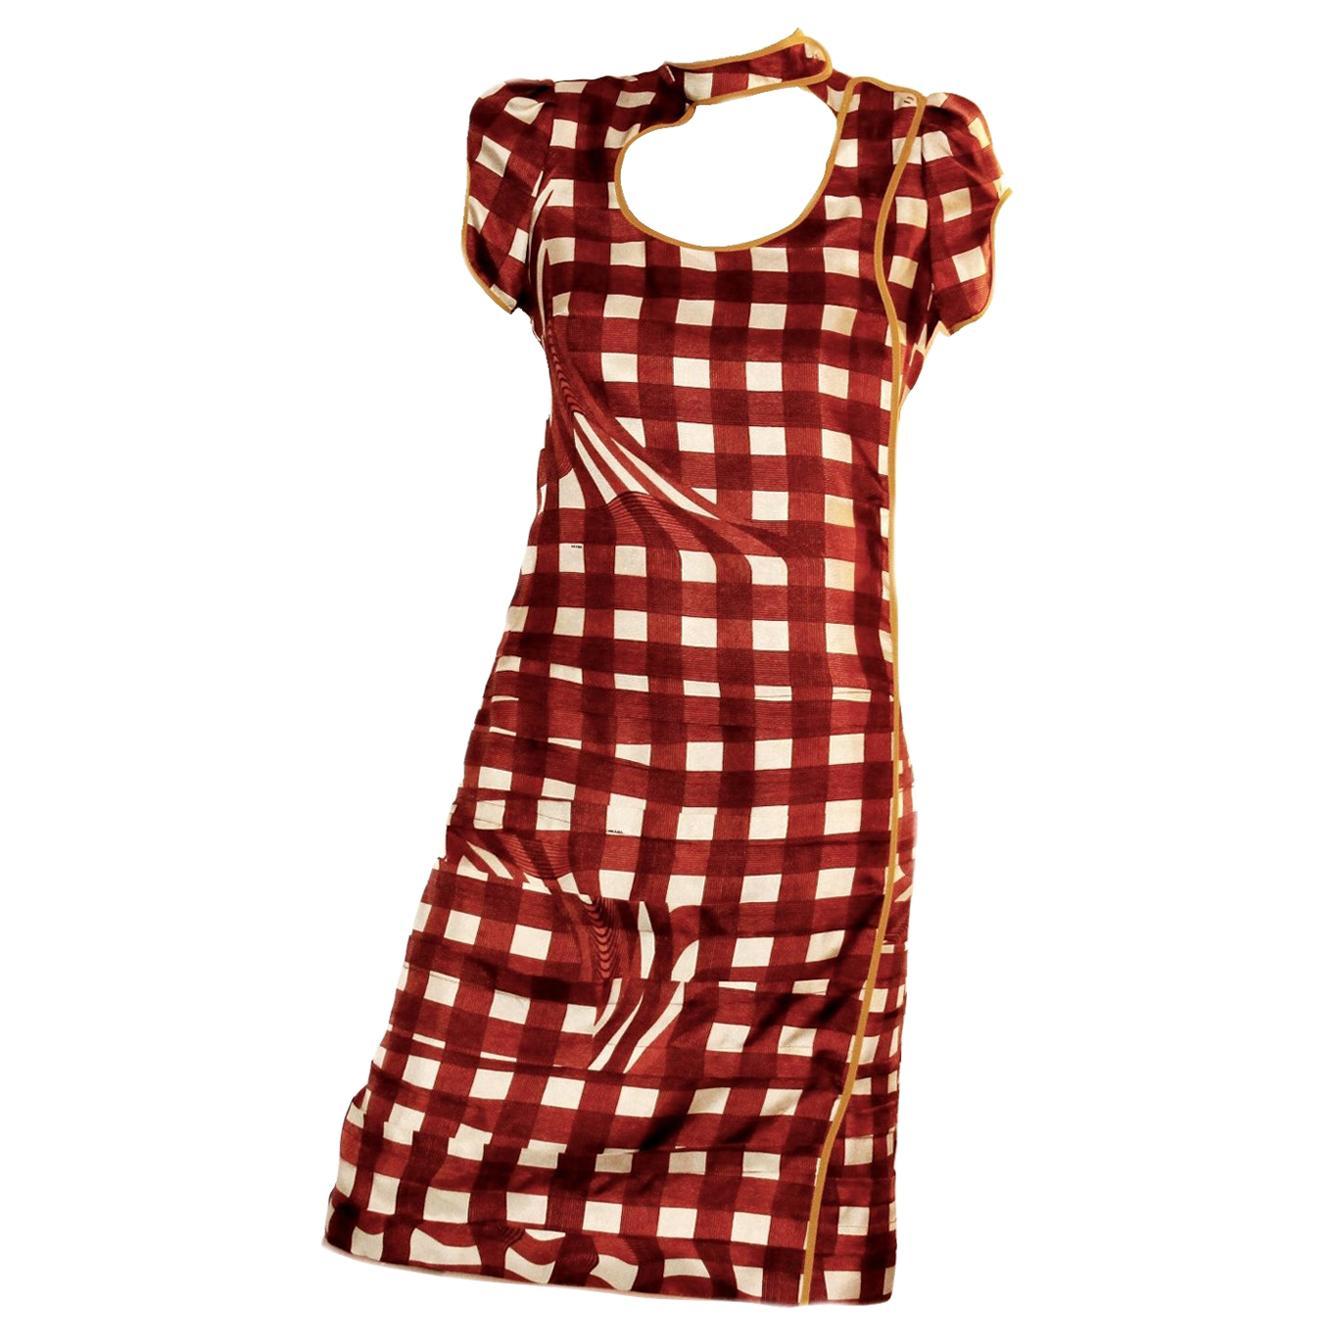 Prada Ruched Fairytale Silk Dress Geometric Print